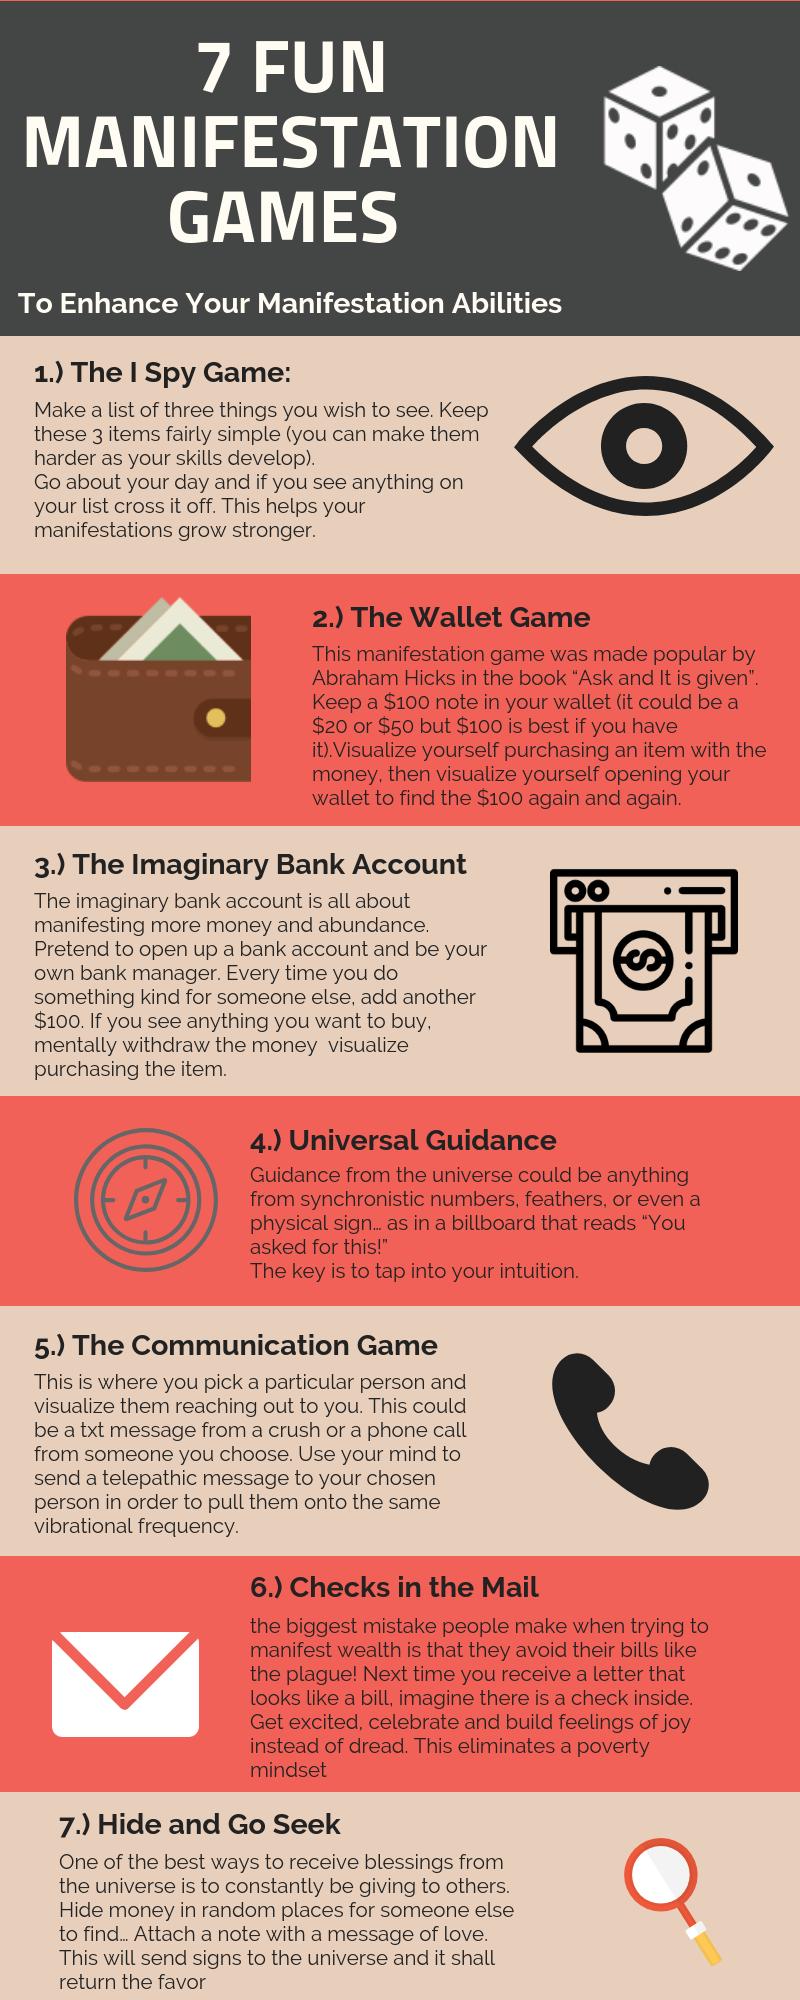 7 Fun Manifestation Games to Enhance Your Manifestation